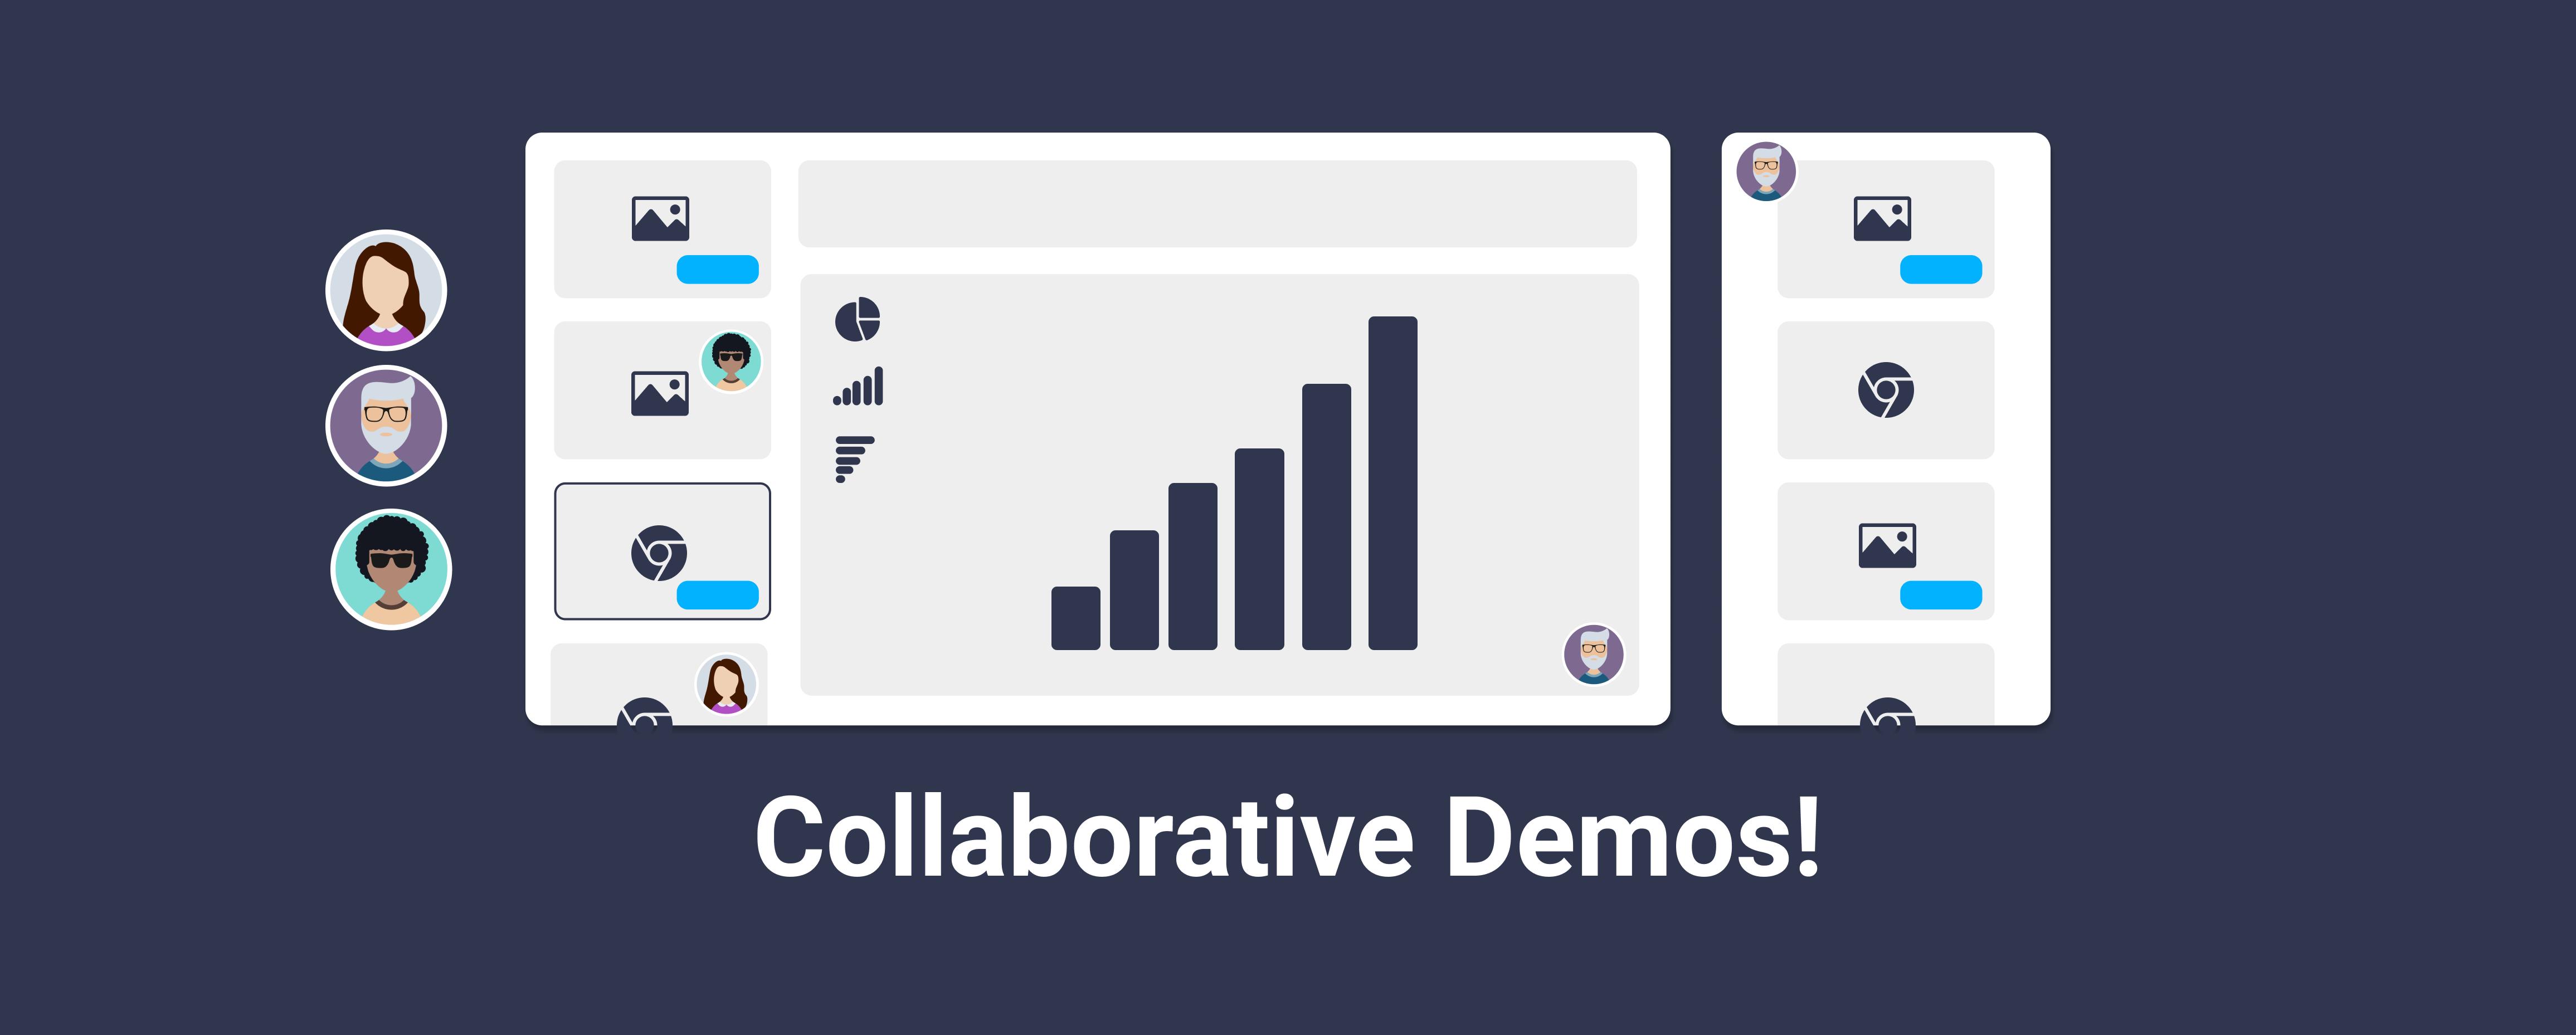 Collaborative Demos: Crush Sales Across The Entire Team